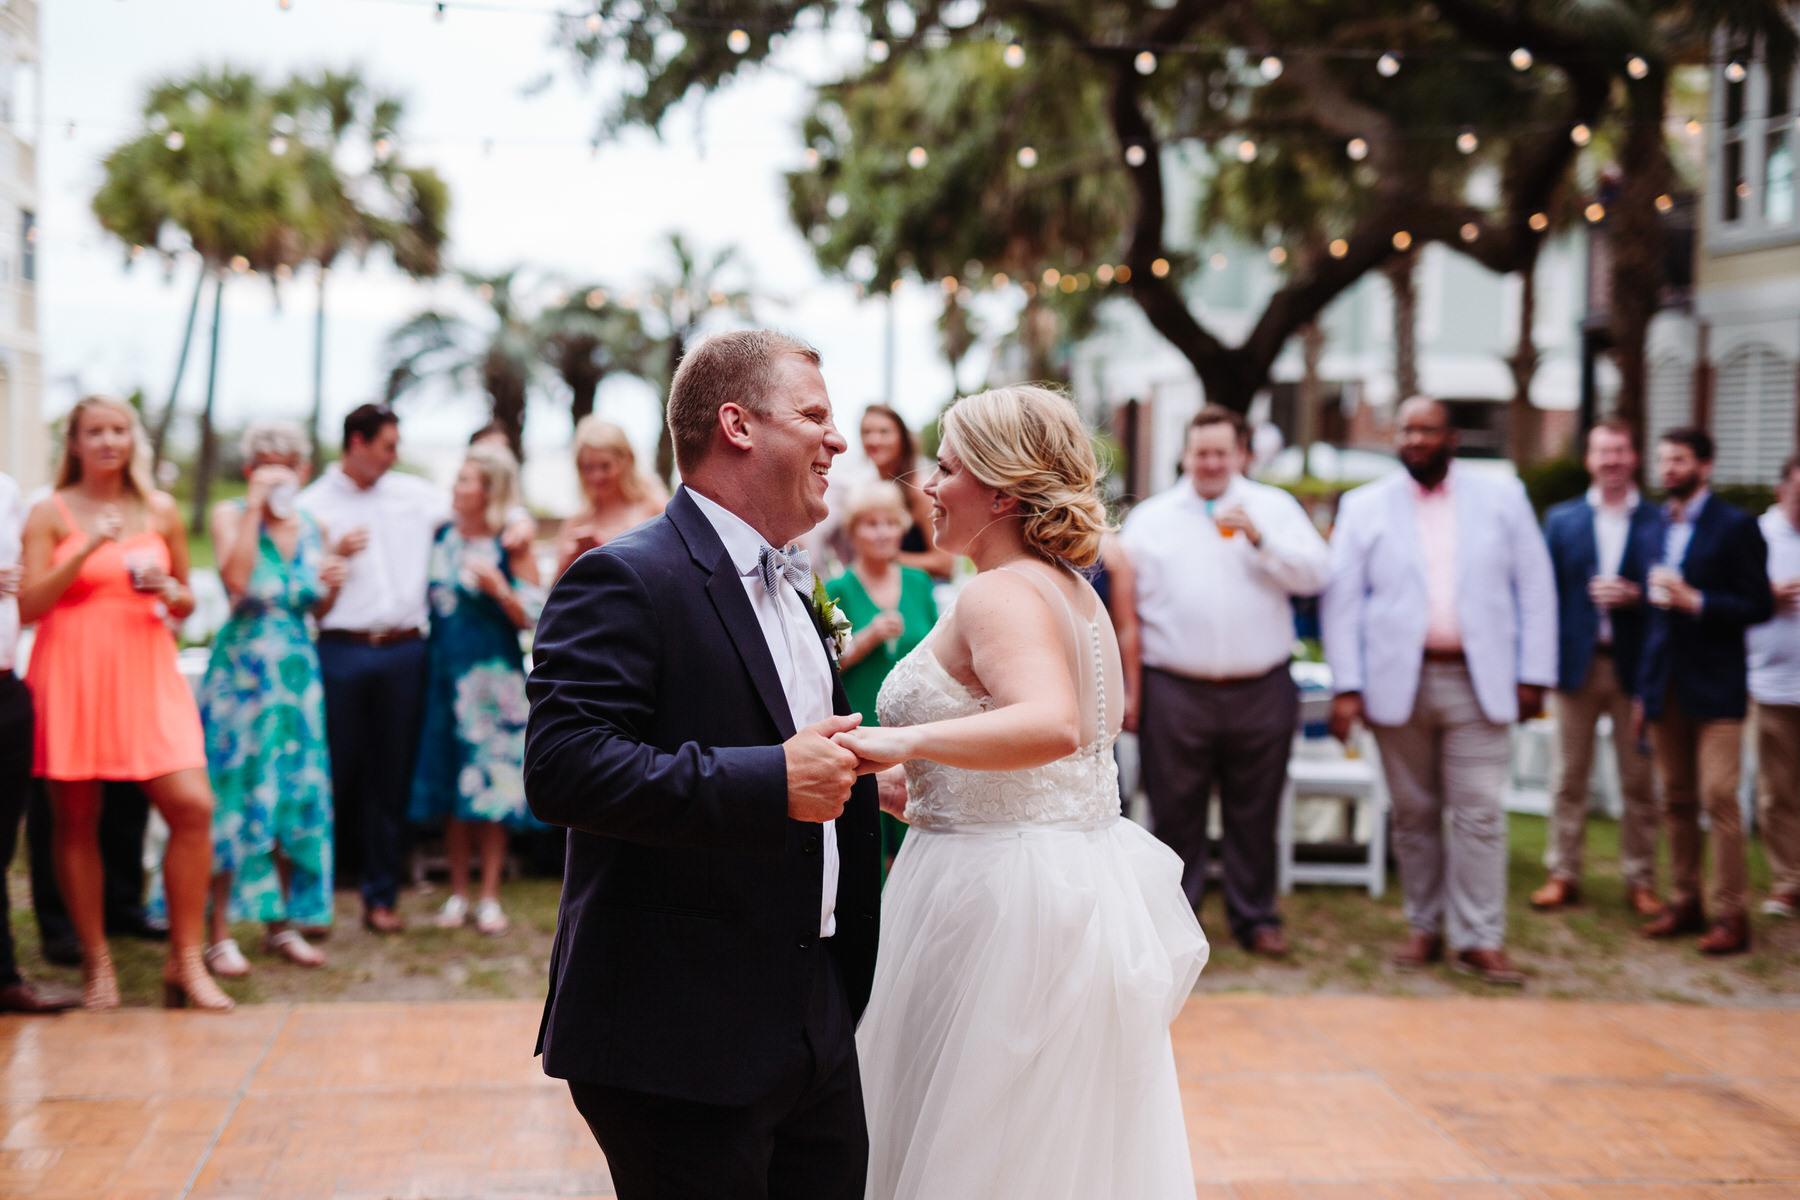 wild-dunes-charleston-isle-of-palms-IOP-wedding-860.JPG